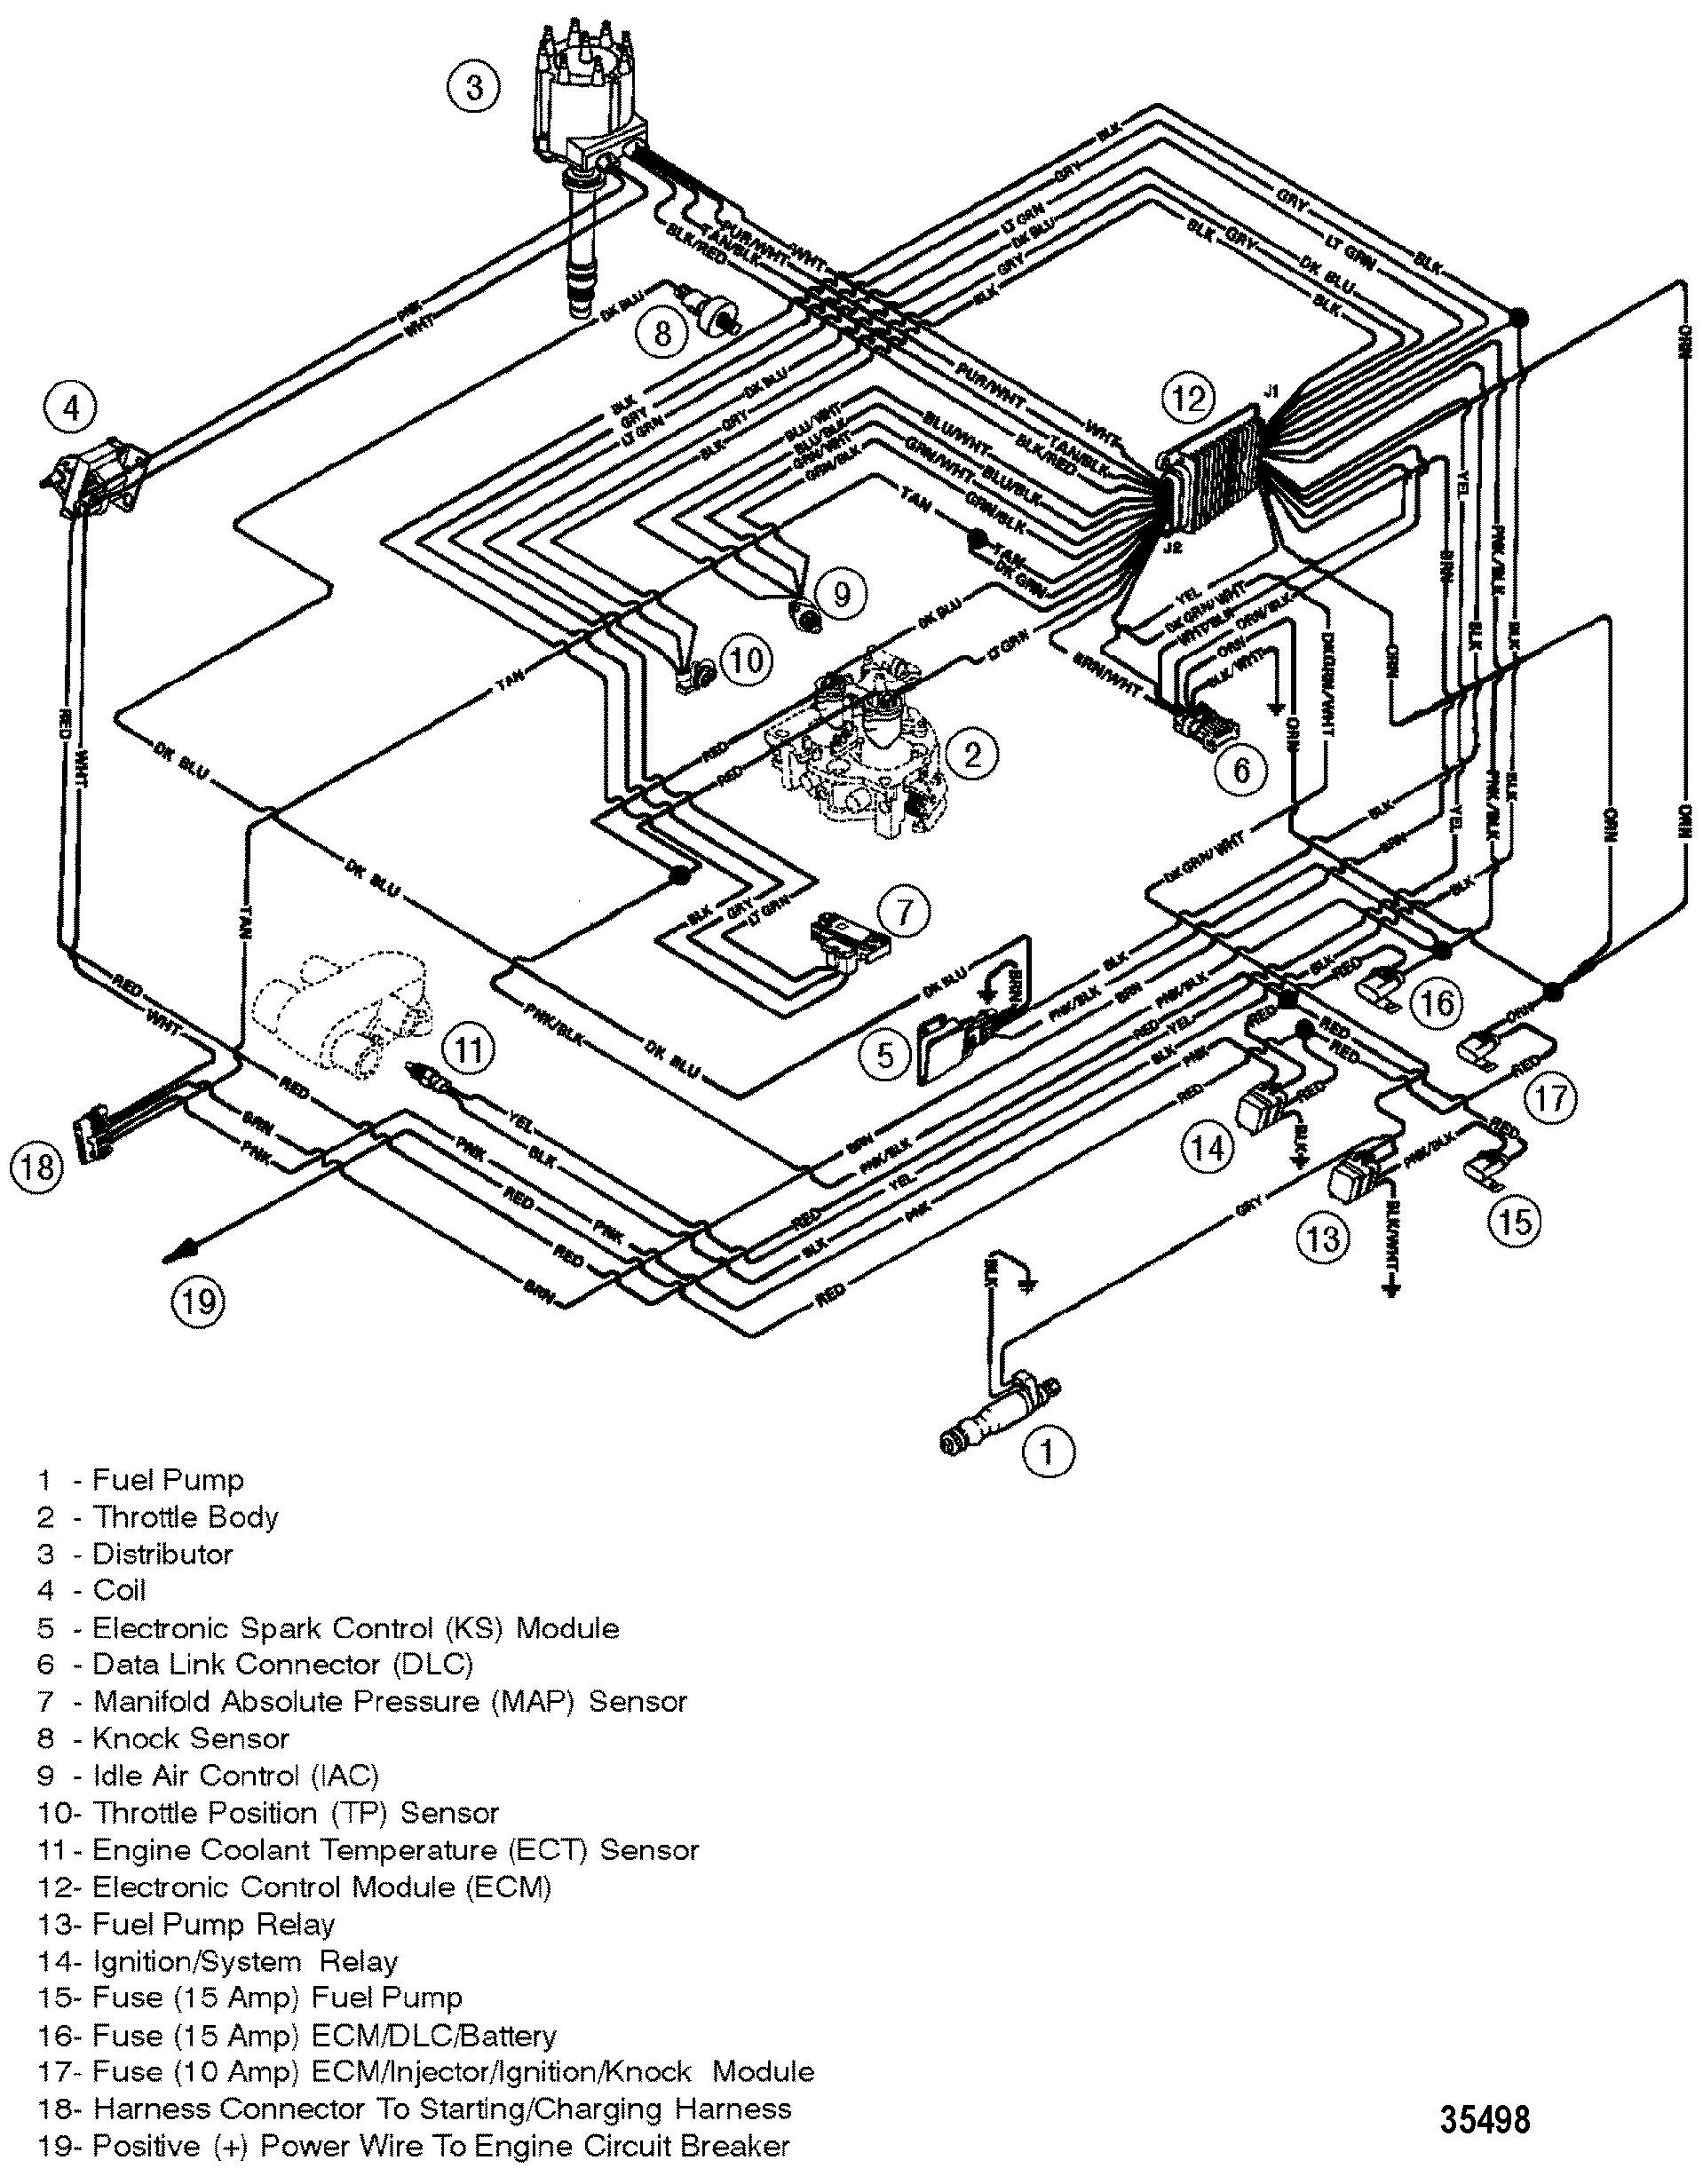 Каталог запчастей MERCRUISER остальные 5.0L EFI GM 305 V-8